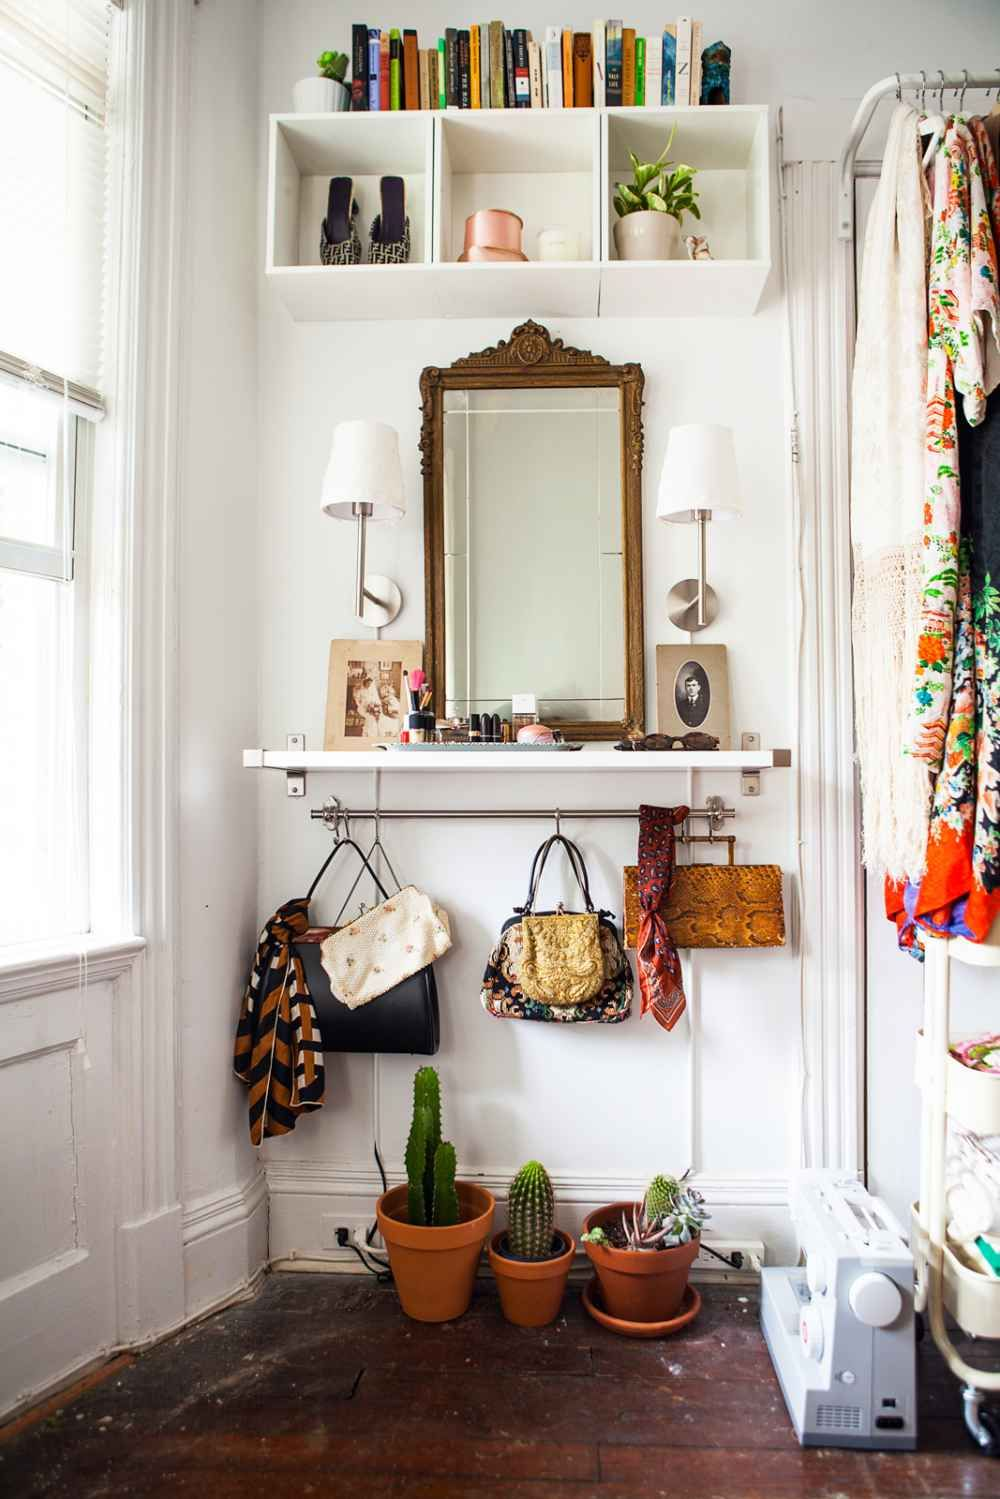 Narrow hallway storage solutions  How to organize an awkward closet  Clothing storage Closet